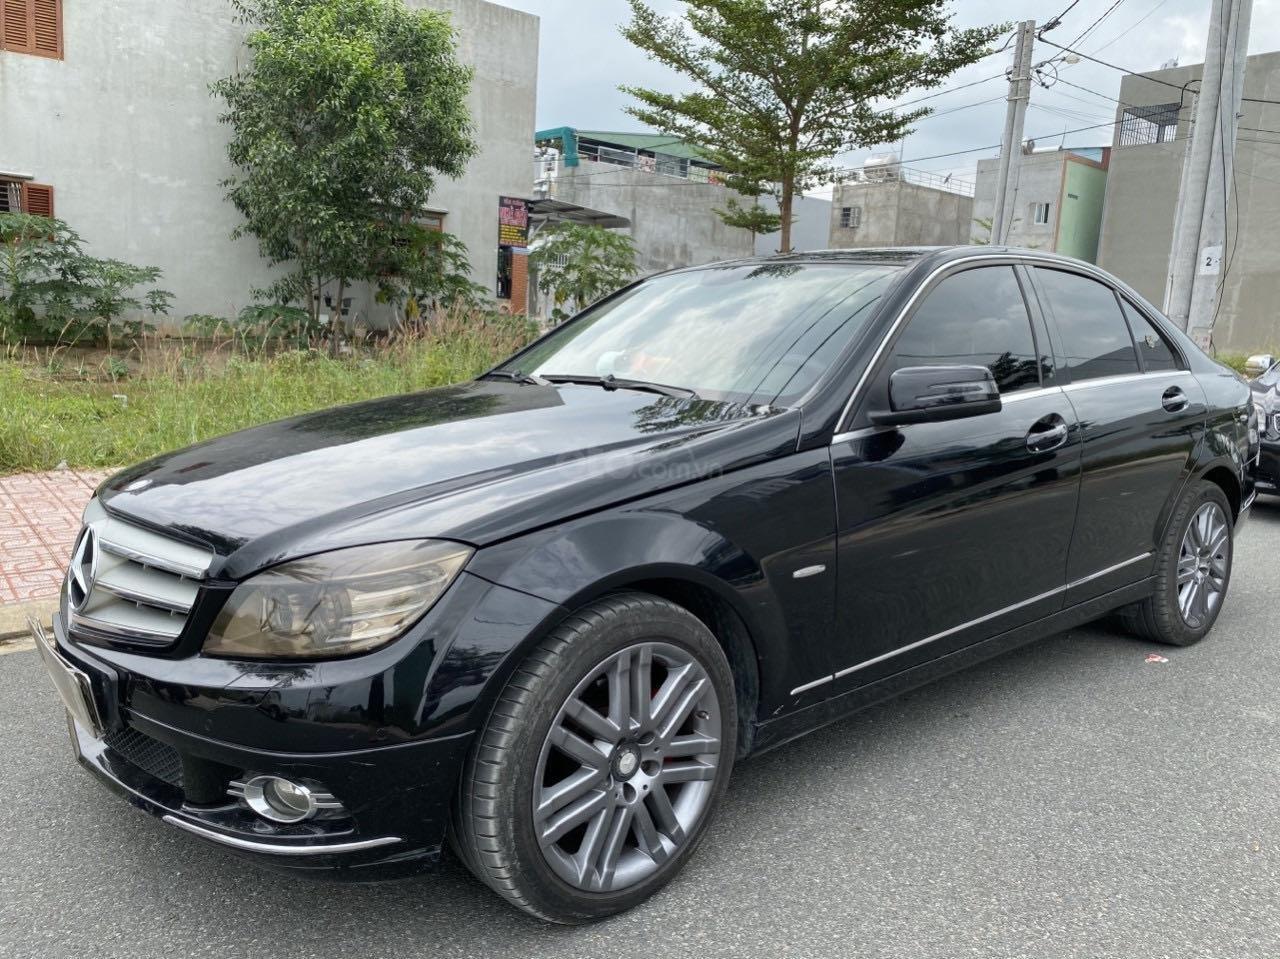 Cần bán xe Mercedes C230 đời 2009, màu đen (3)